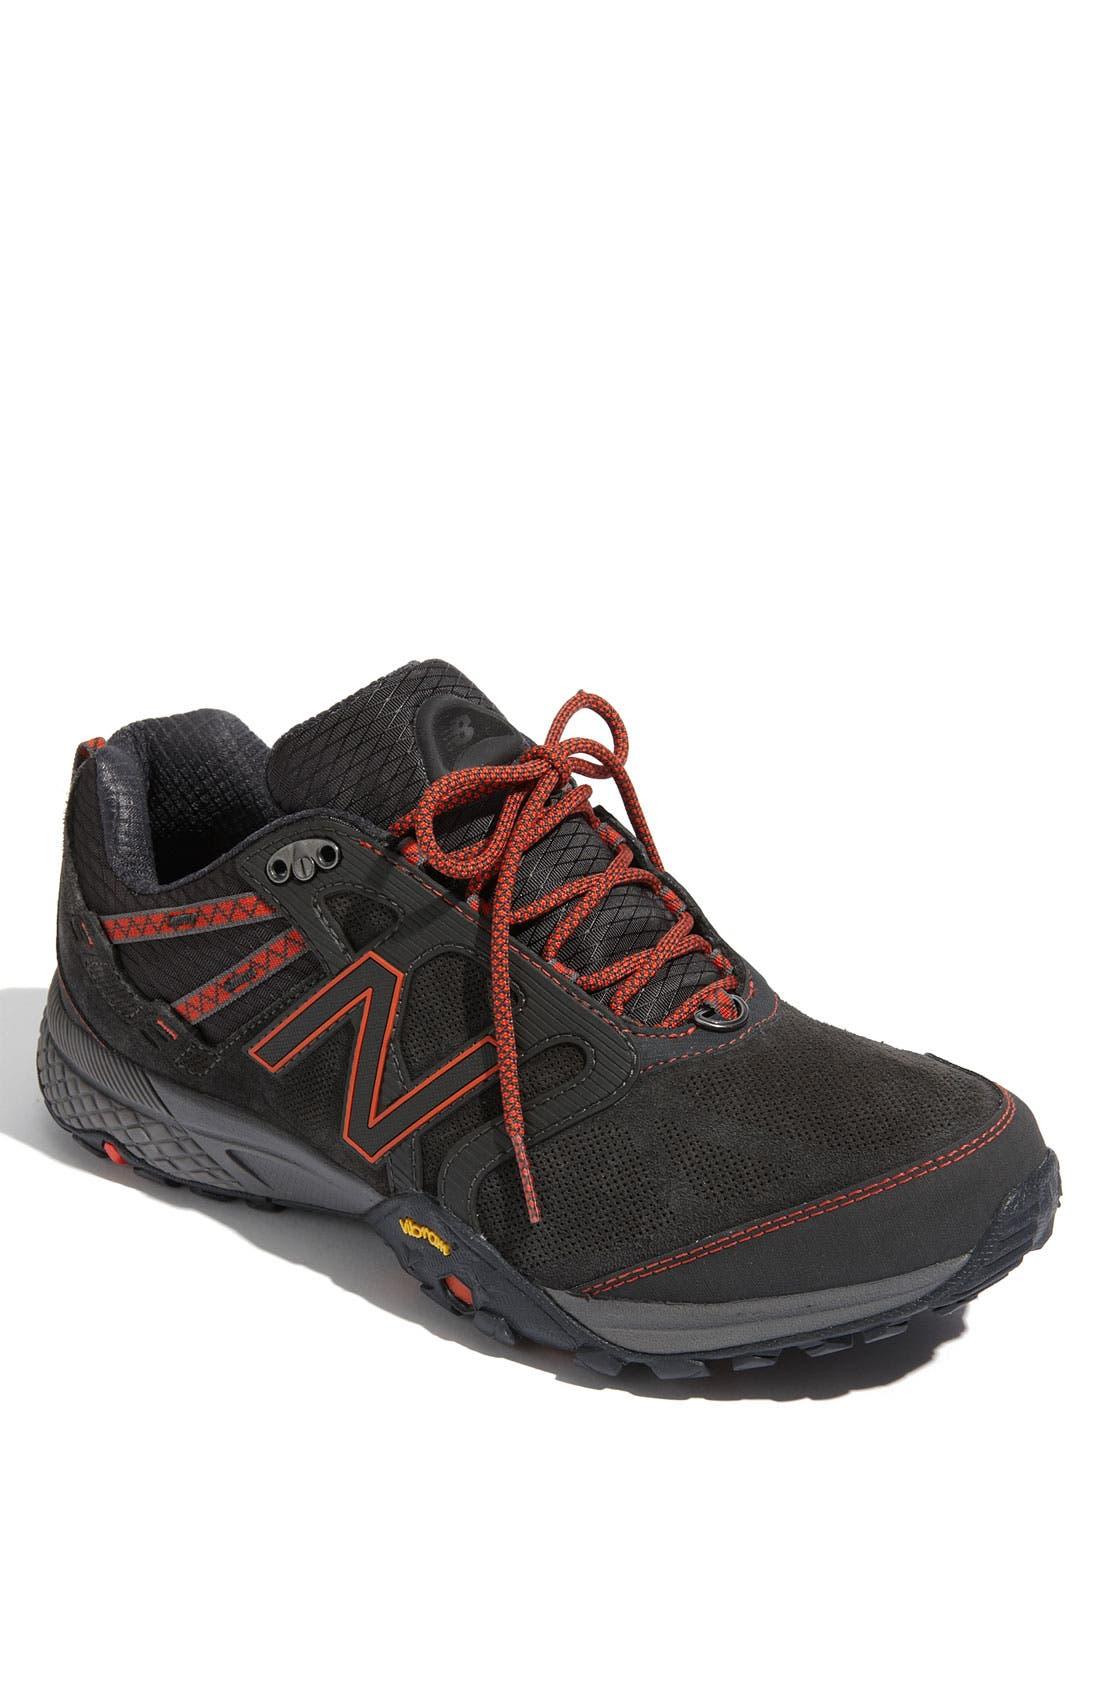 Main Image - New Balance '1521' Multi Sport Shoe (Men)